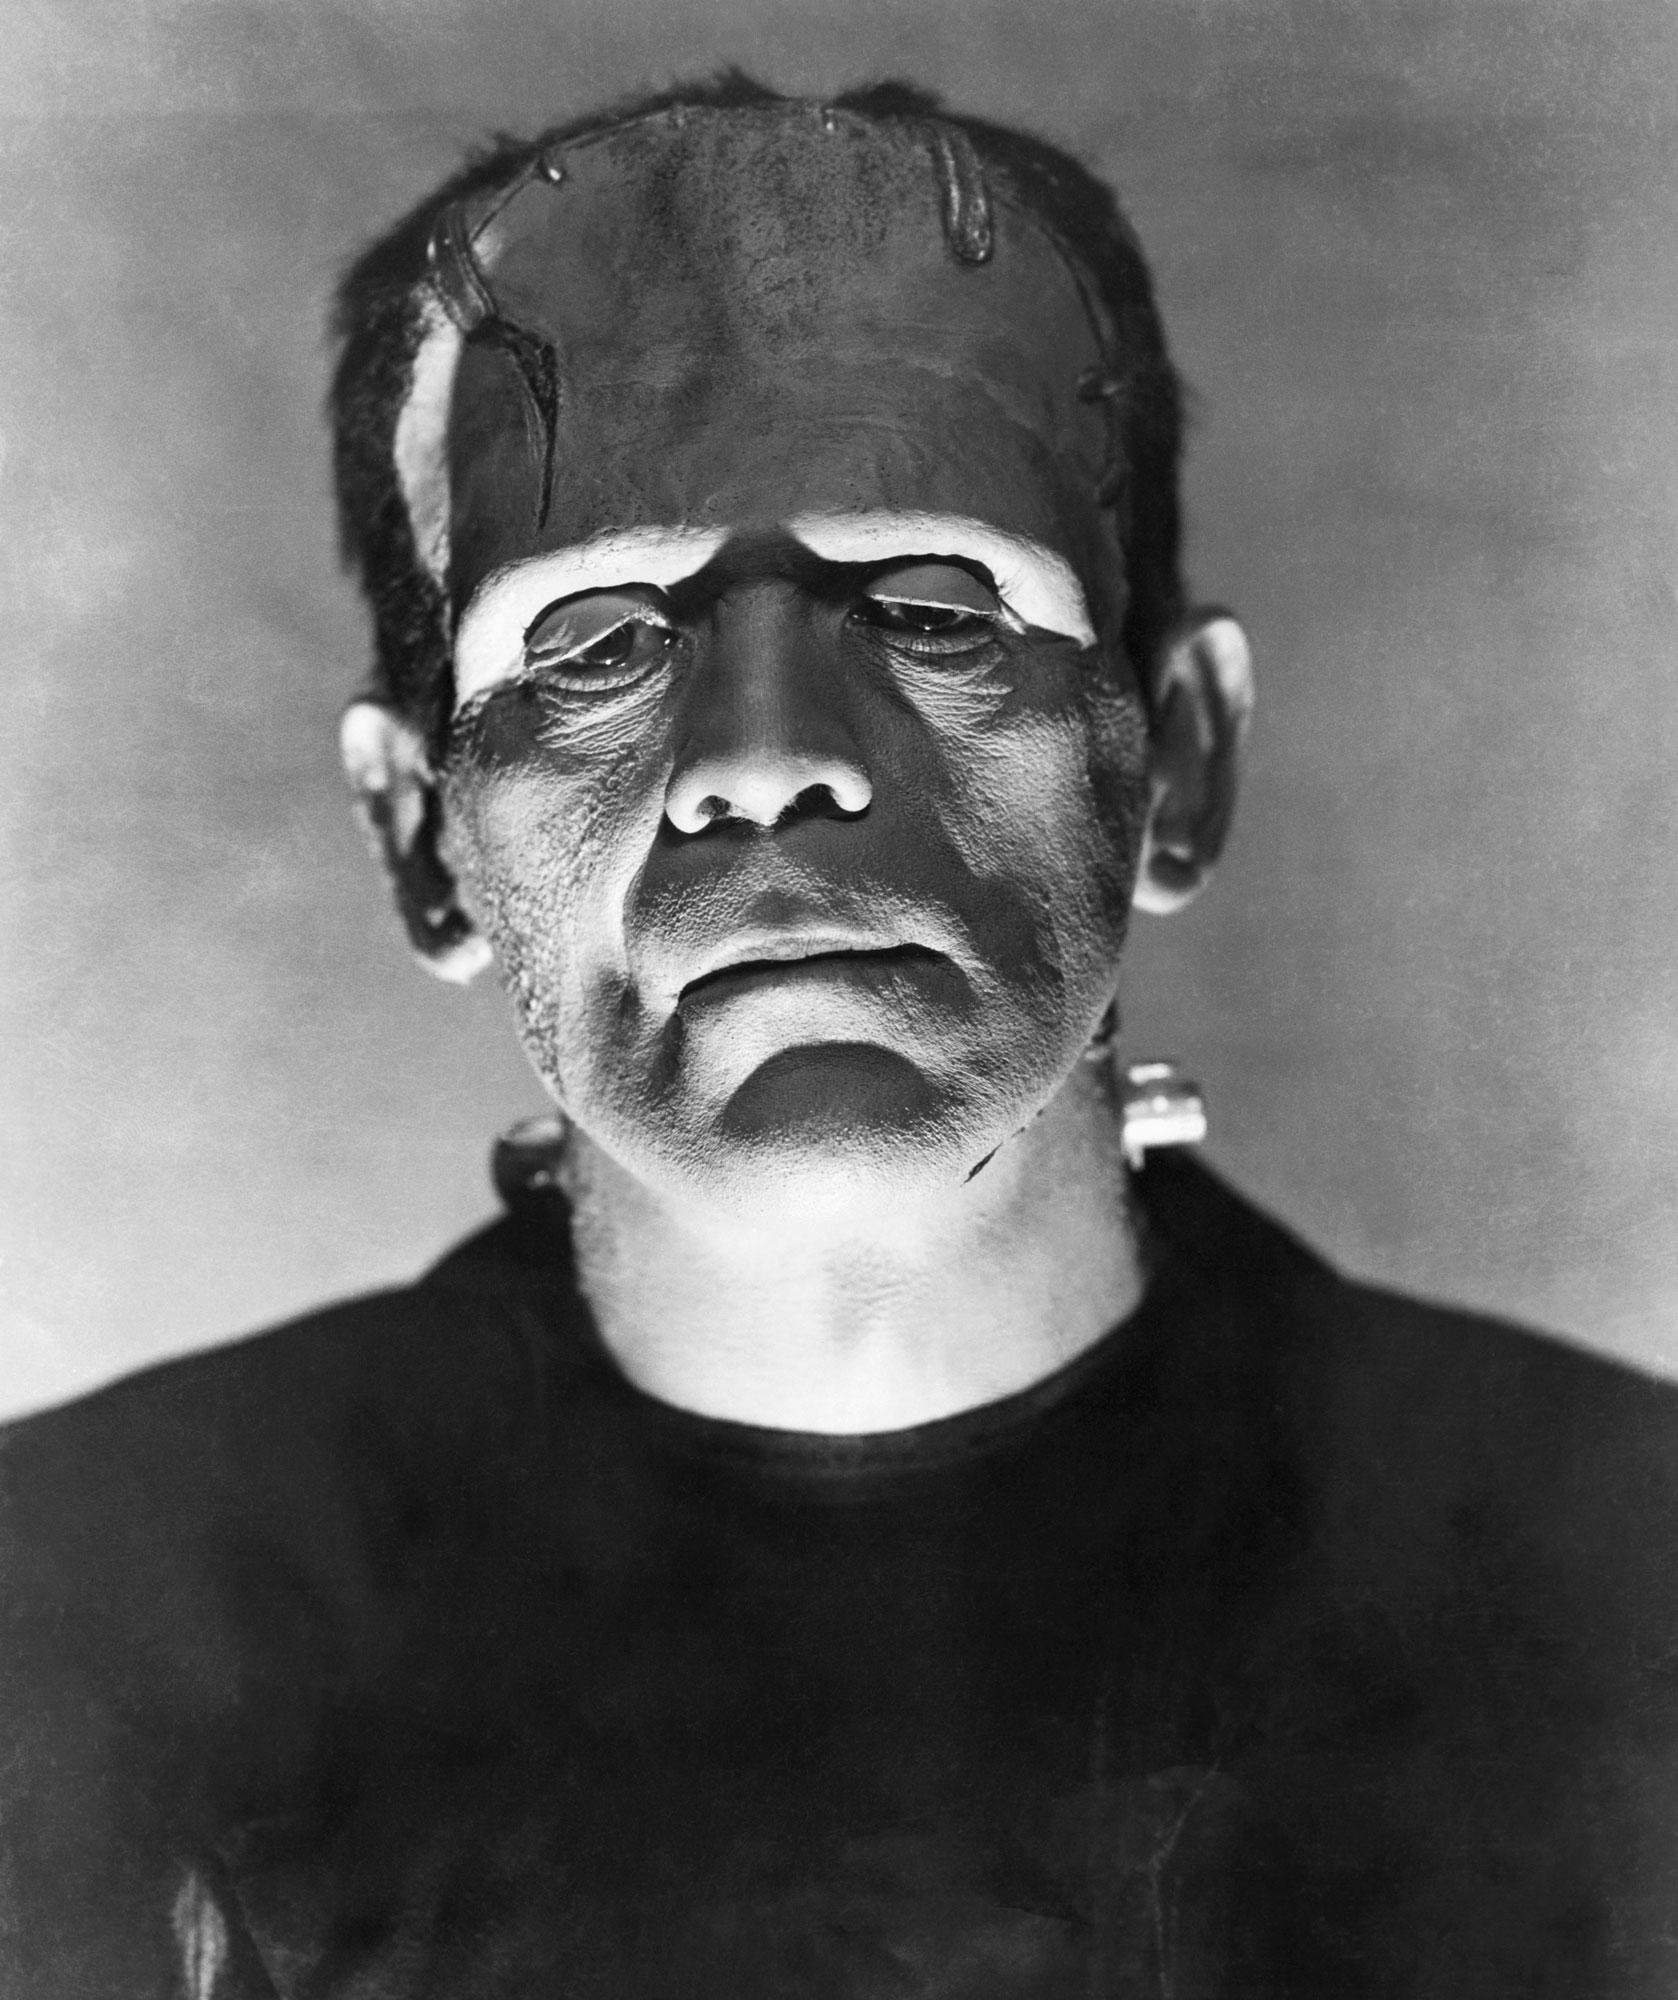 jeune Frankenstein sexe scène grandes images longues Dicks